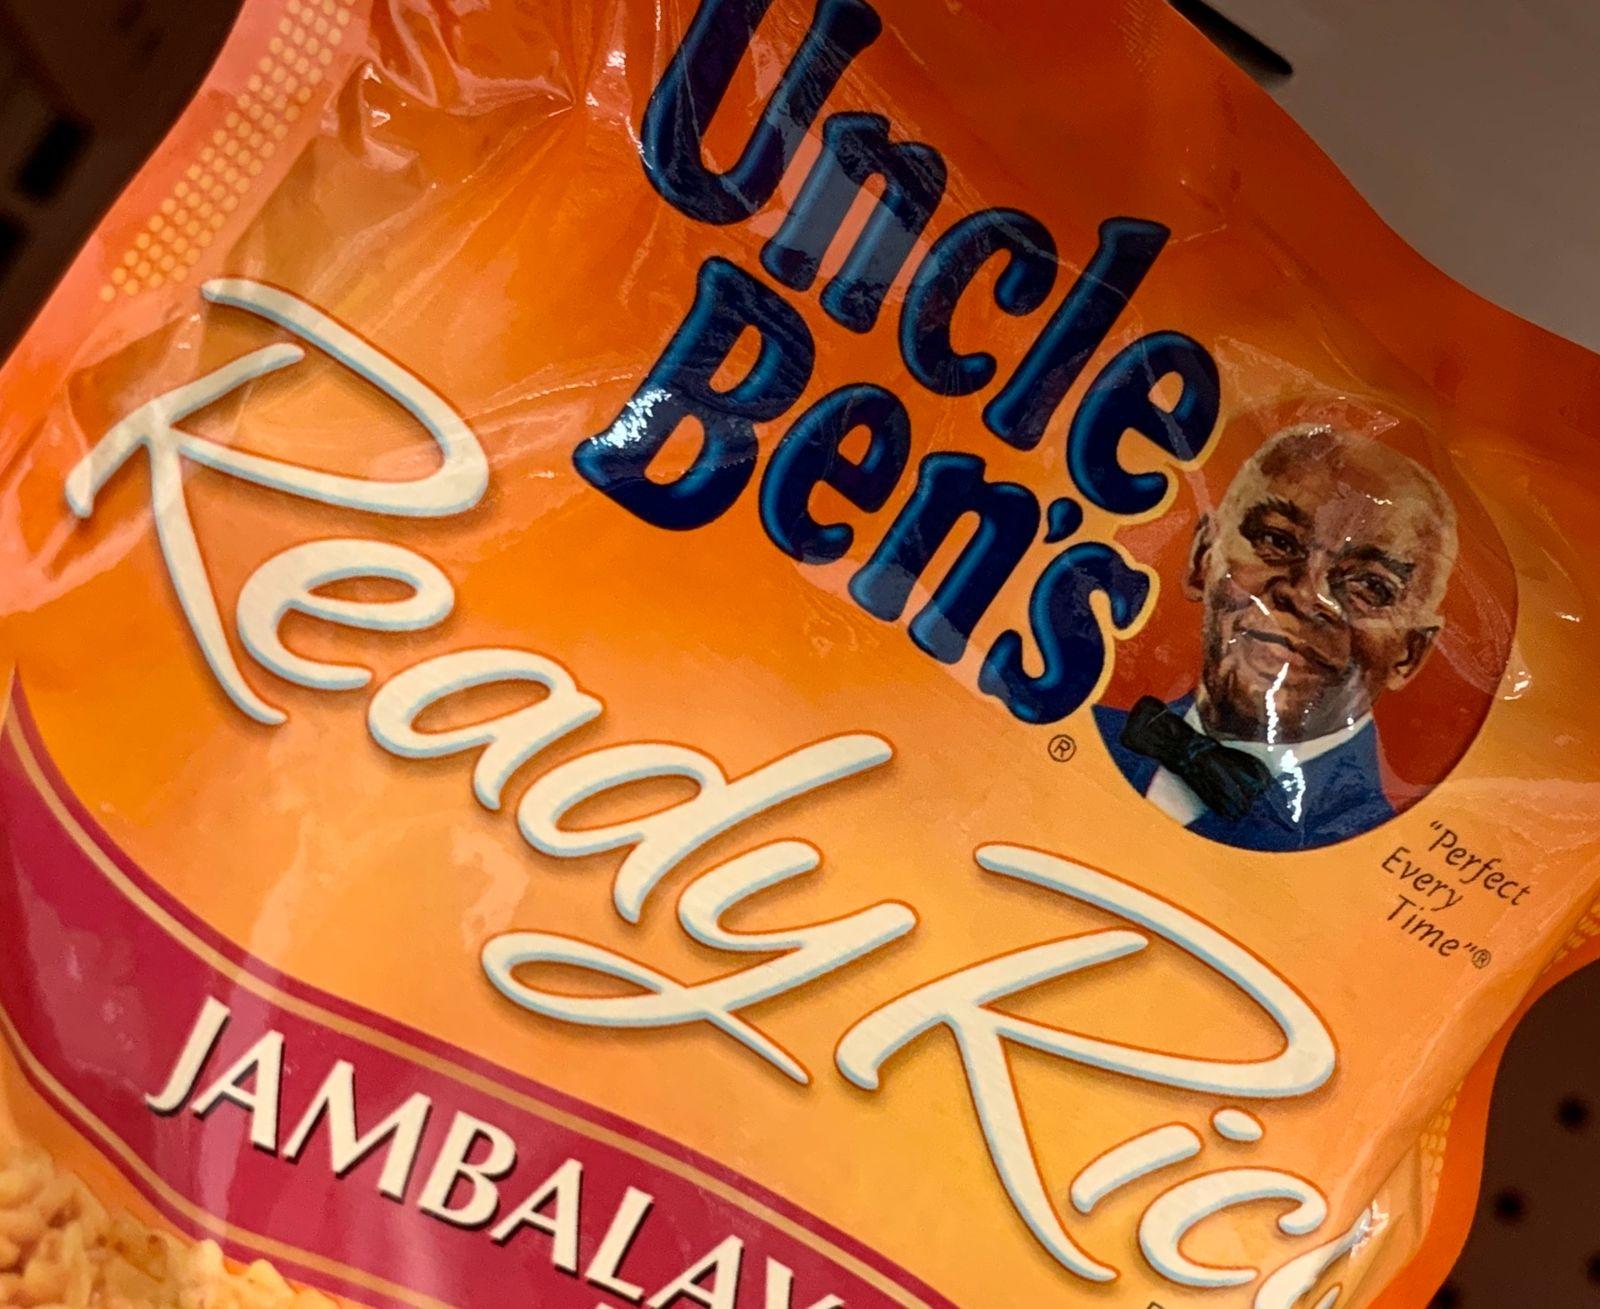 US-POLITICS-UNREST-RACISM-ECONOMY-FOOD-DRINK